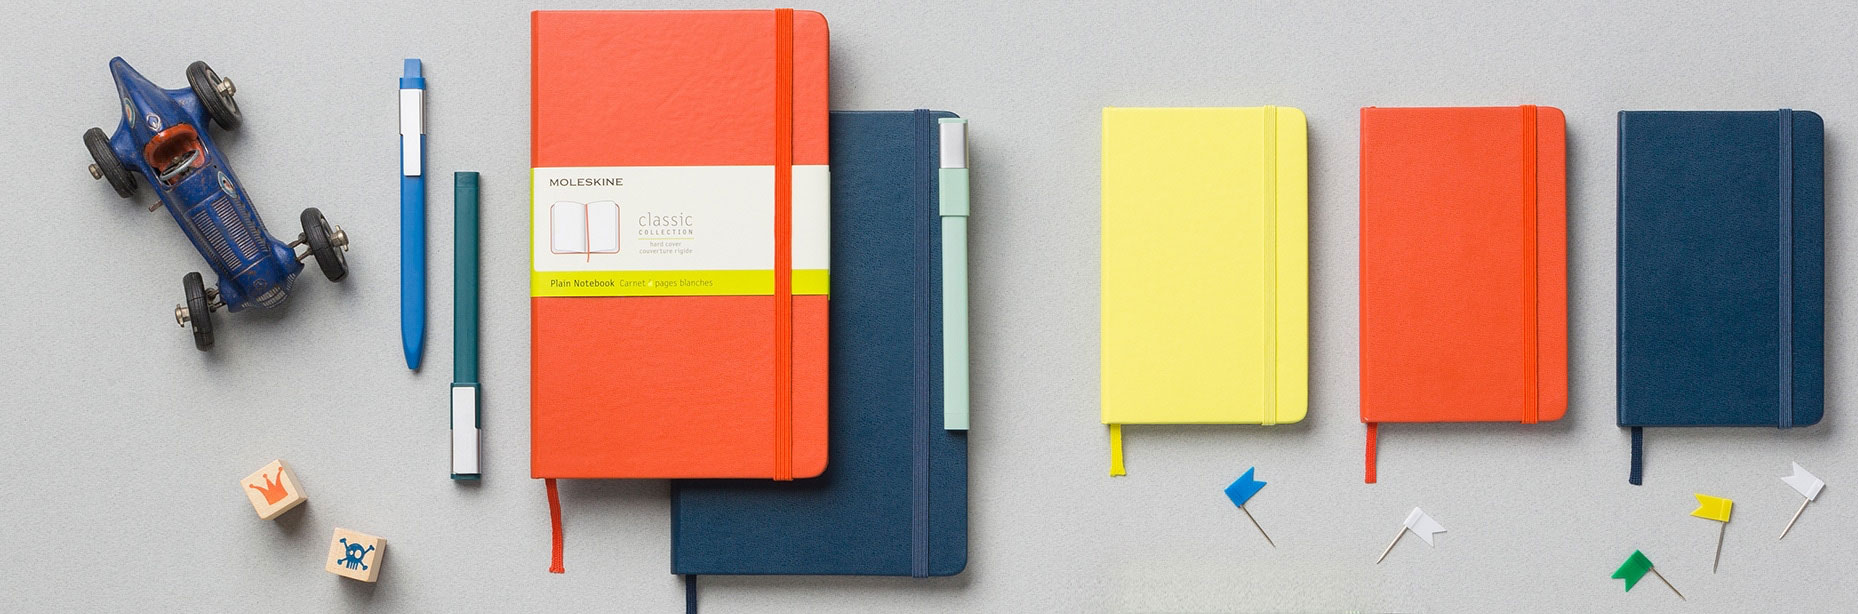 Moslekine Classic Hardbound Notebooks